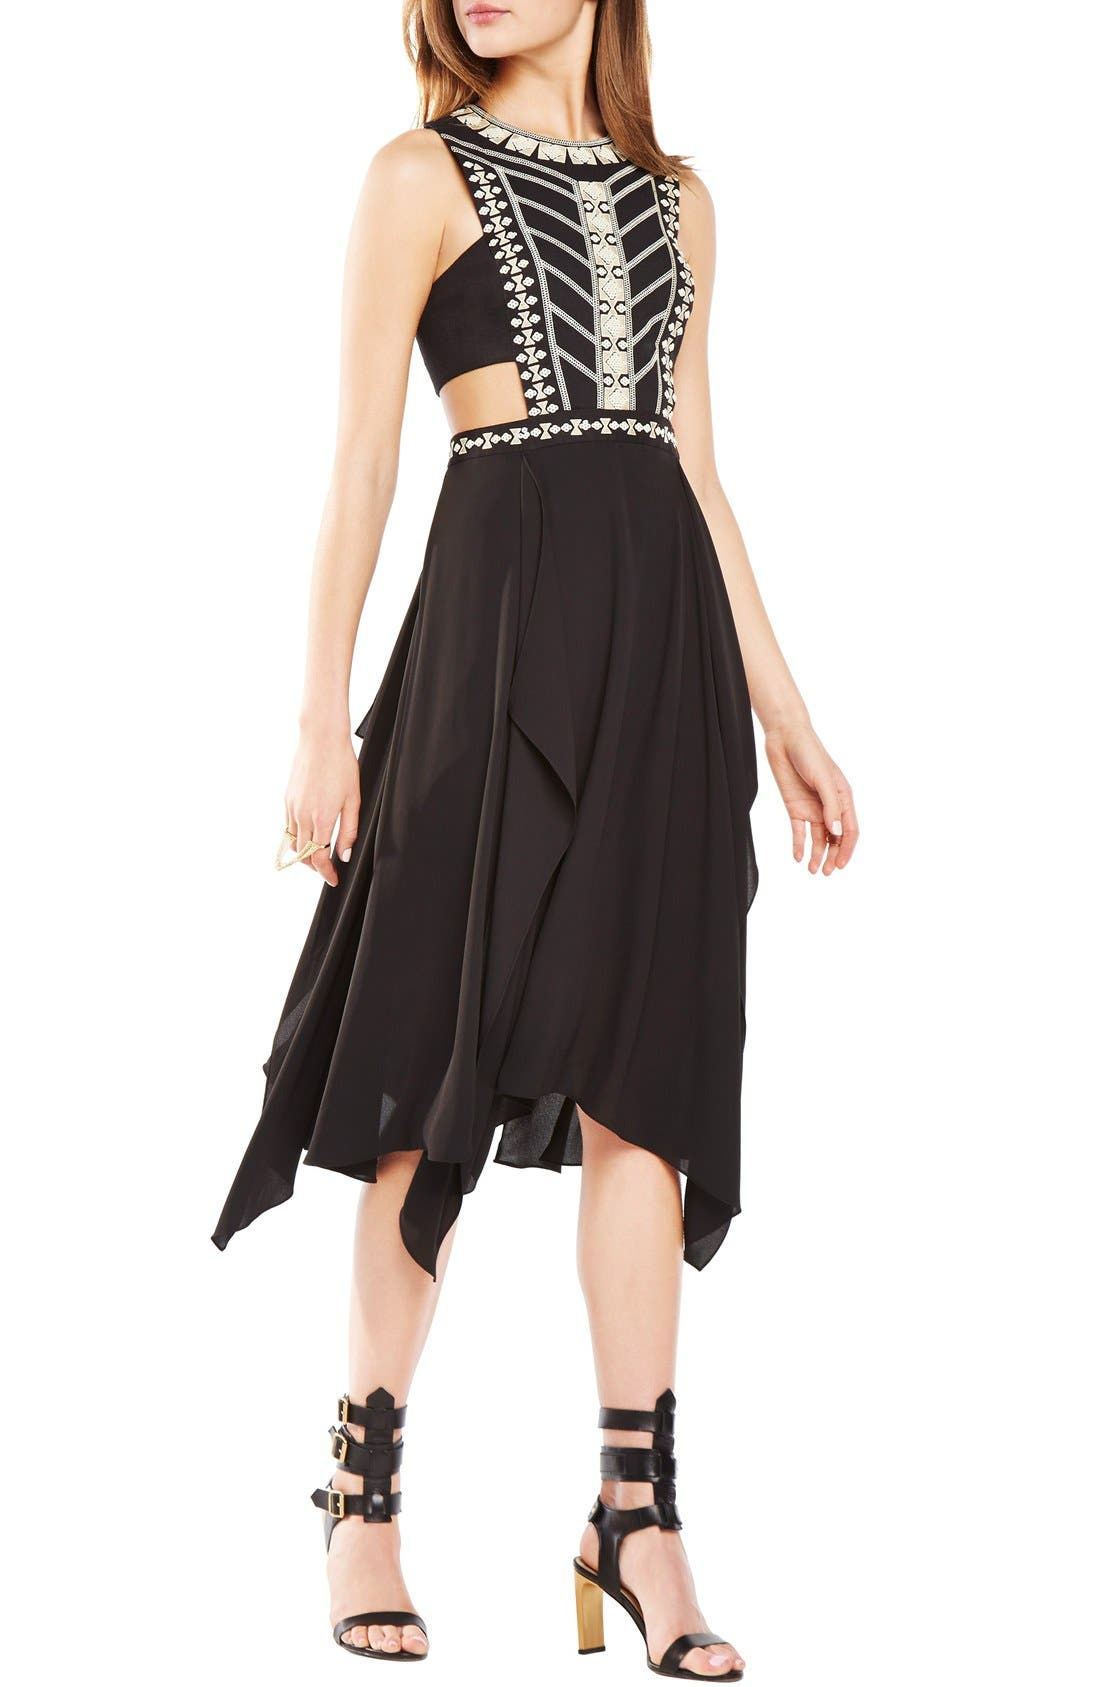 Alternate Image 1 Selected - BCBGMAXAZRIA 'Adelia' Cutout Embellished Georgette Midi Dress